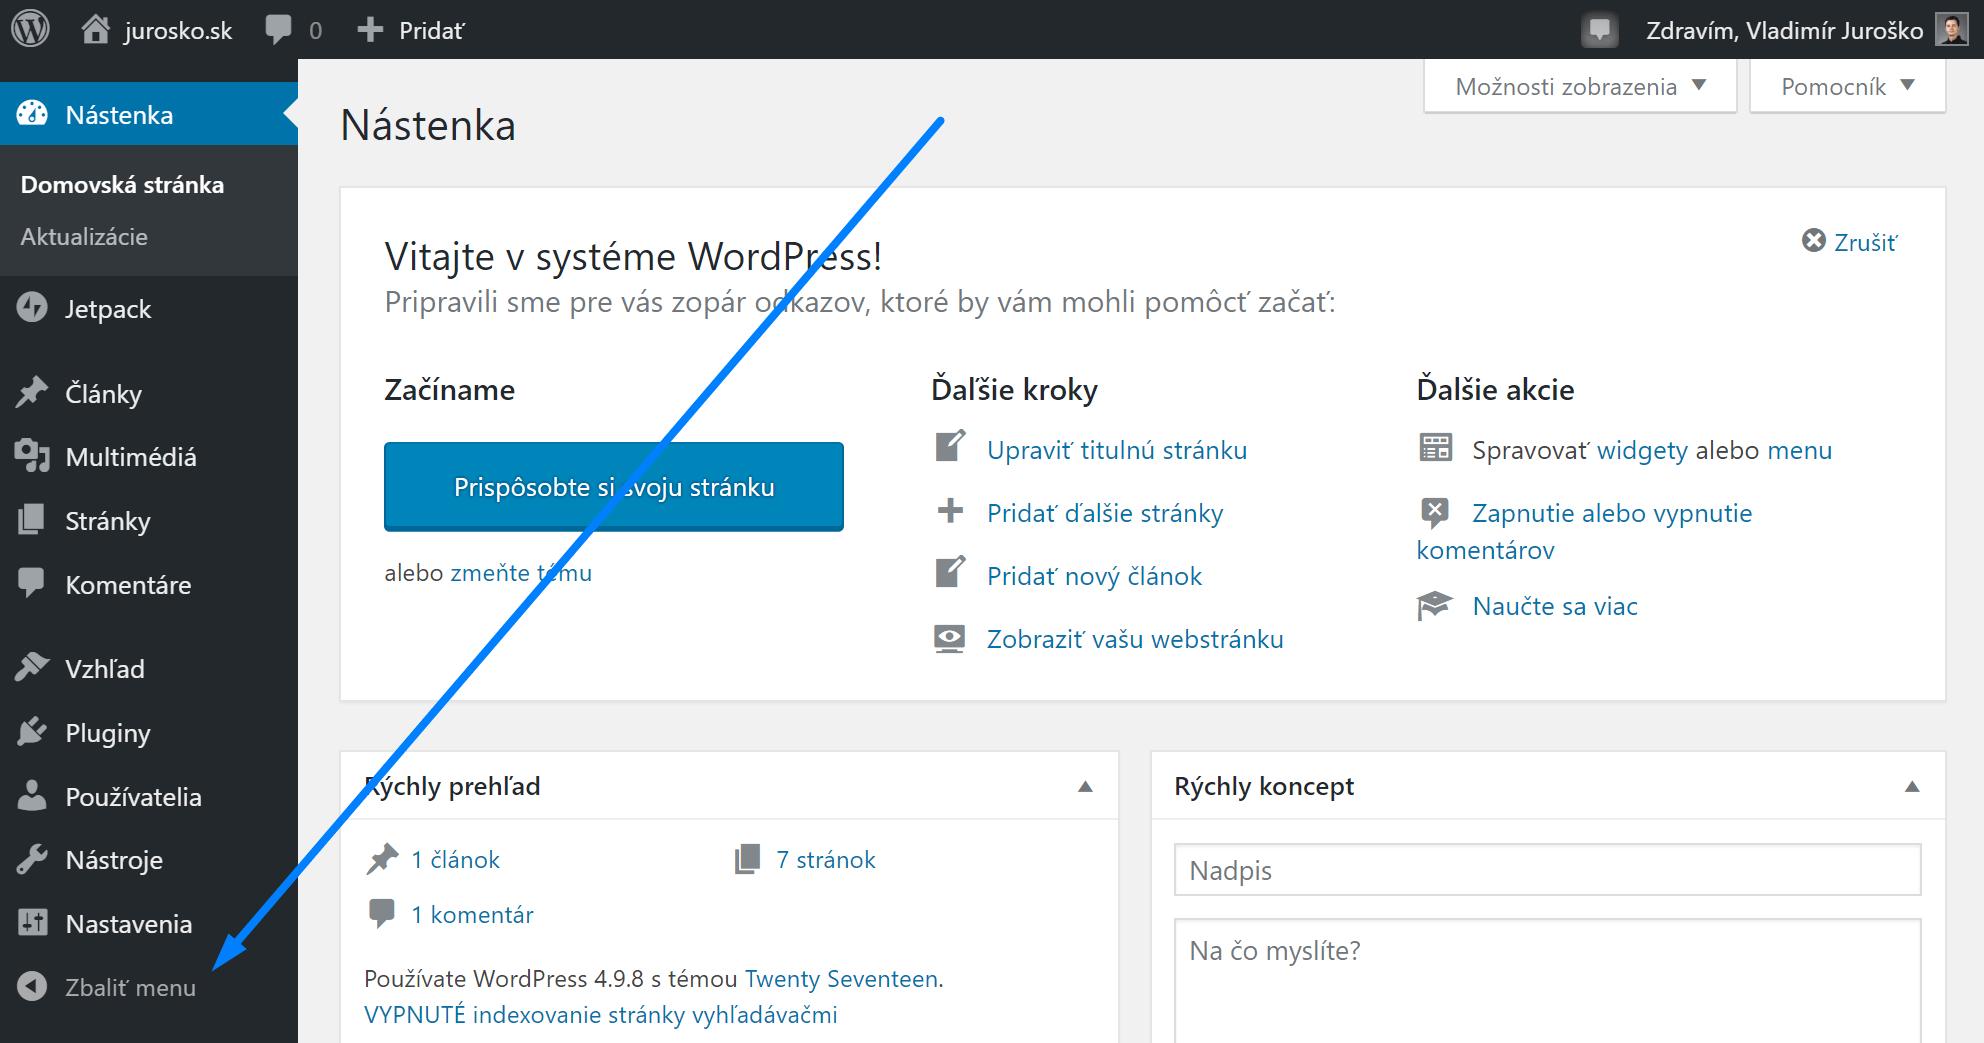 Wordpress zbaliť menu